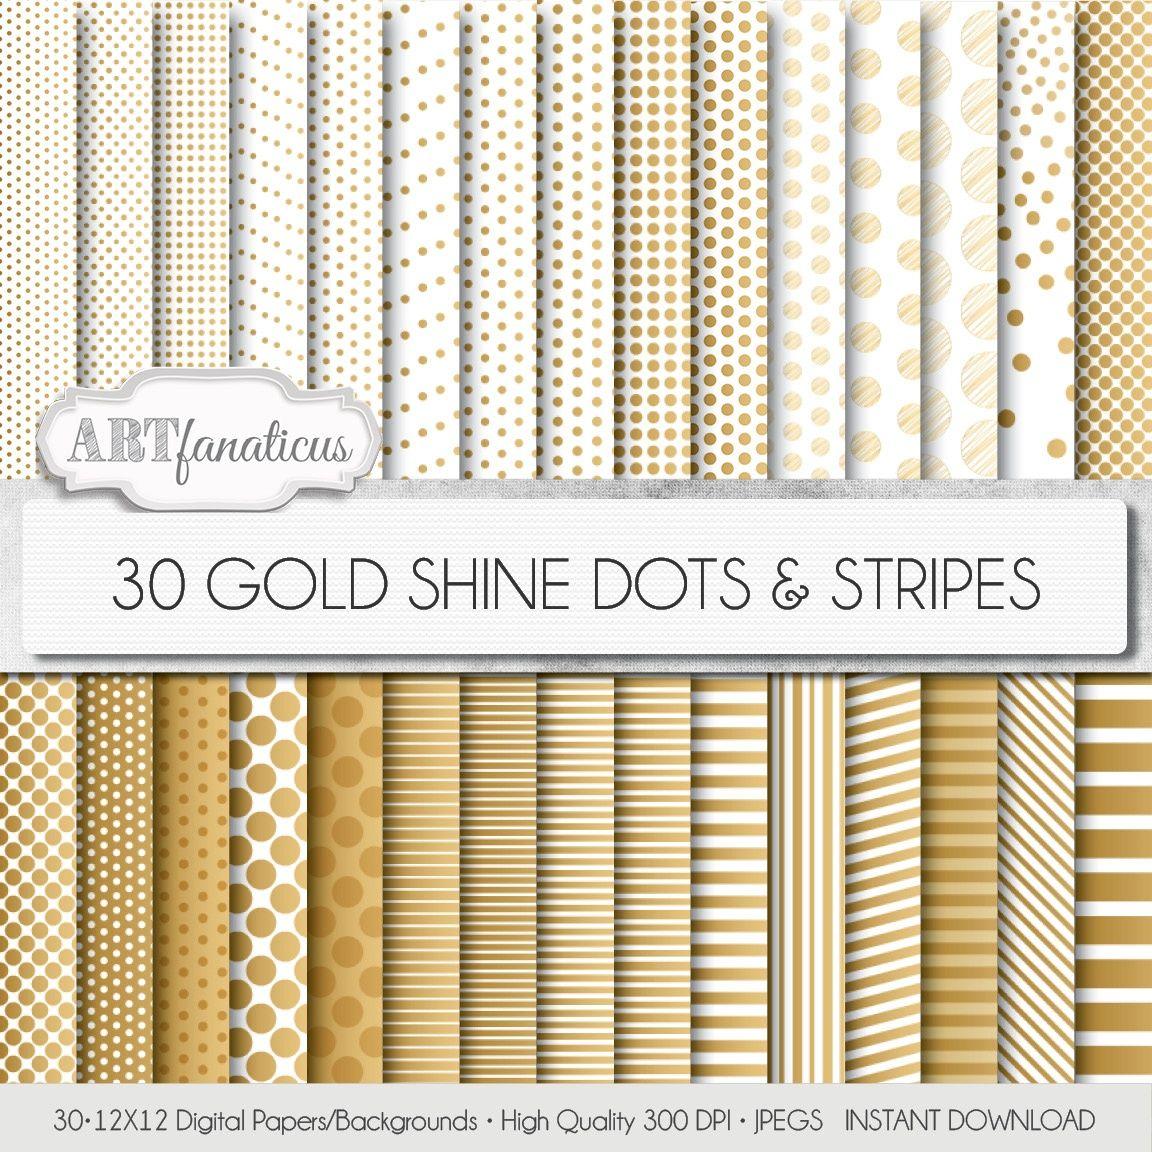 30 GOLD SHINE DOTS & STRIPES DIGITAL PAPER